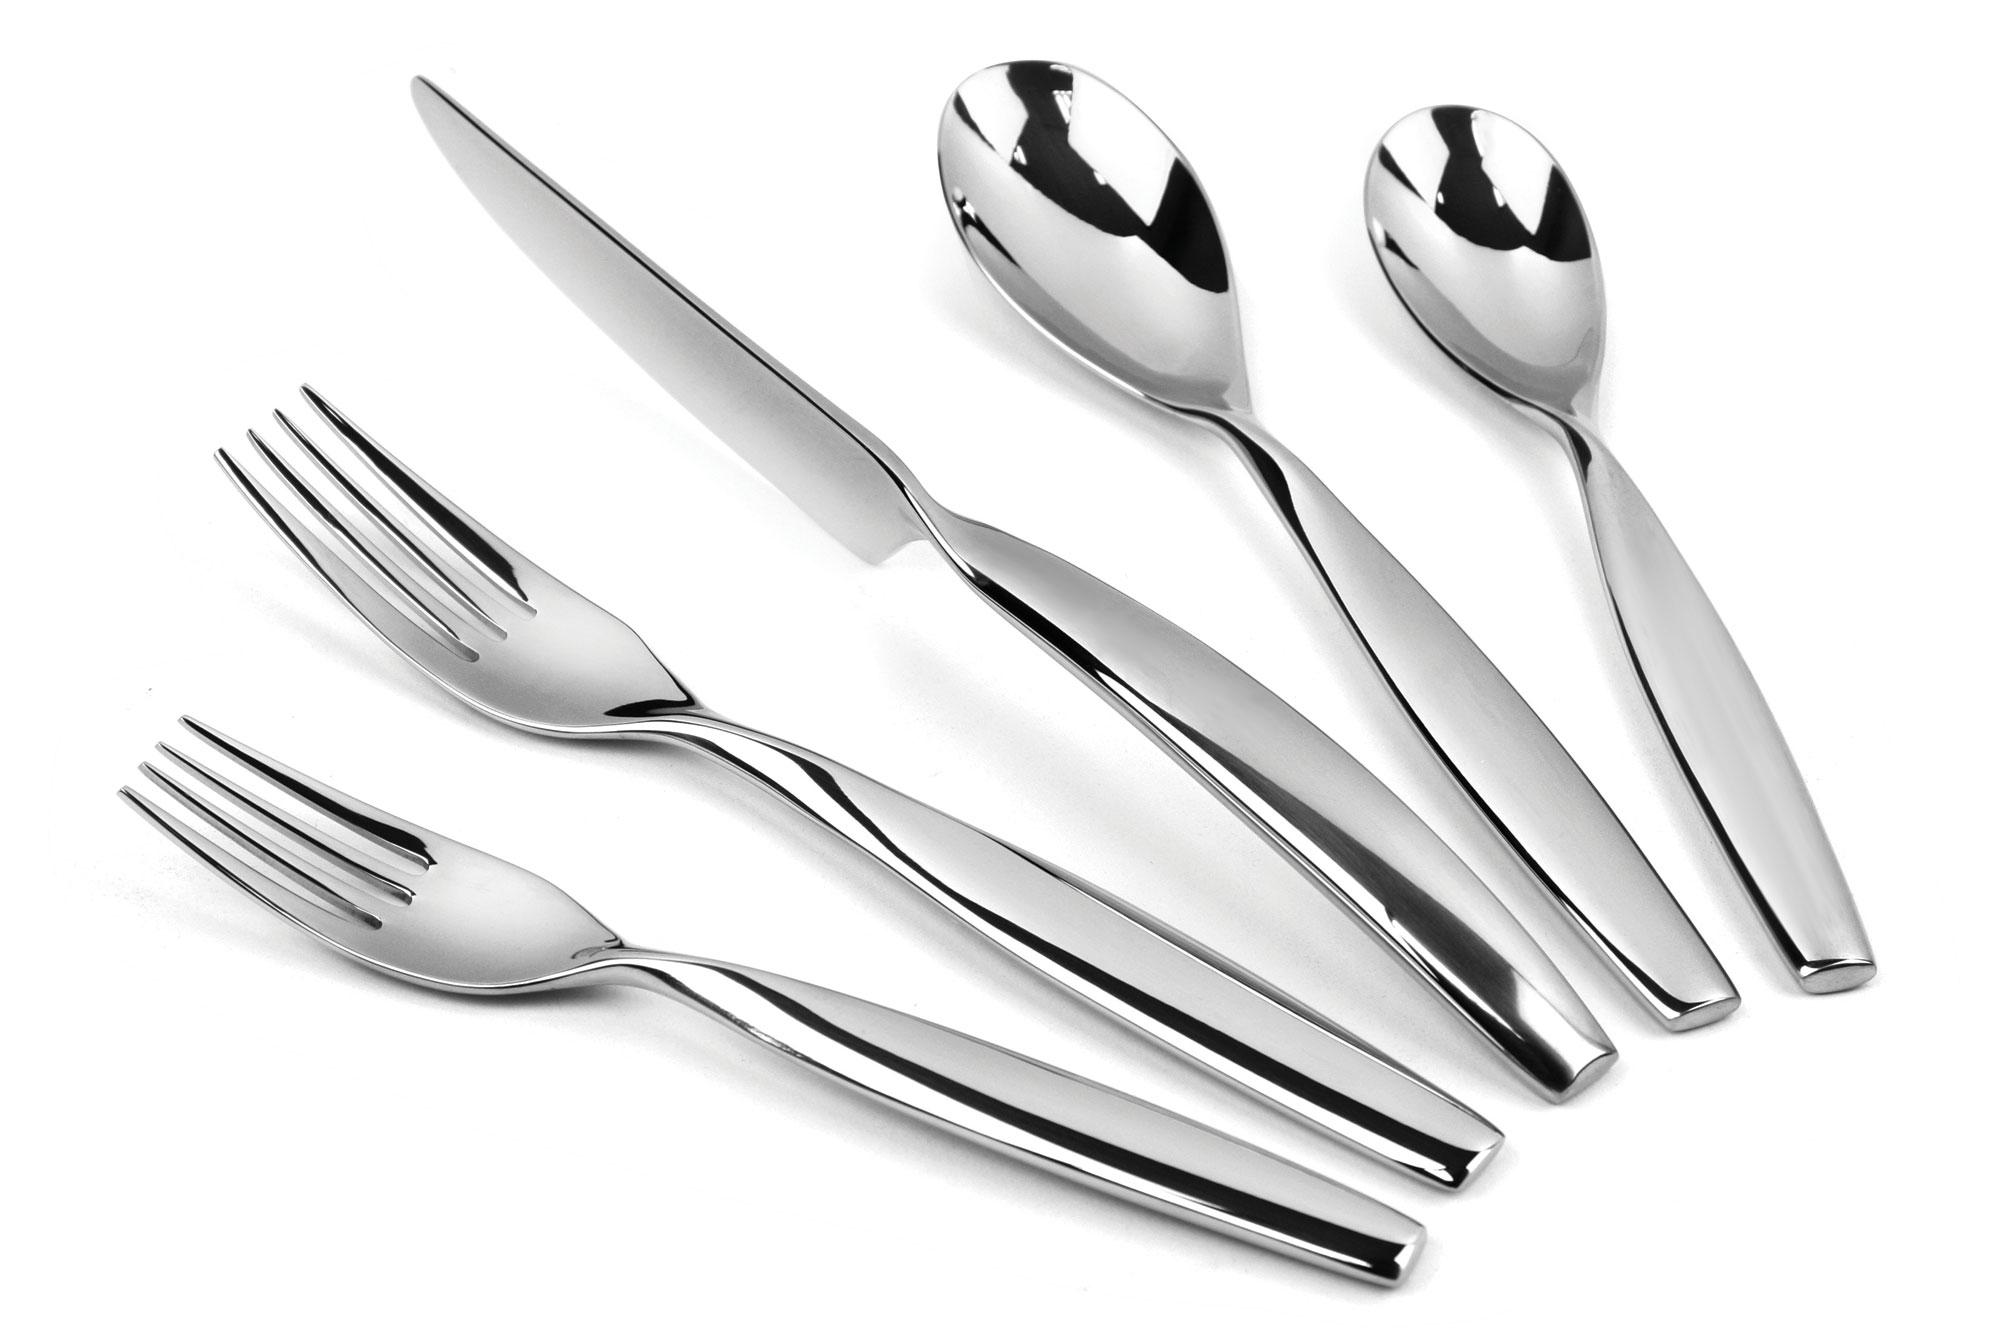 Yamazaki swivel stainless steel flatware set 20 piece Best brand of silverware